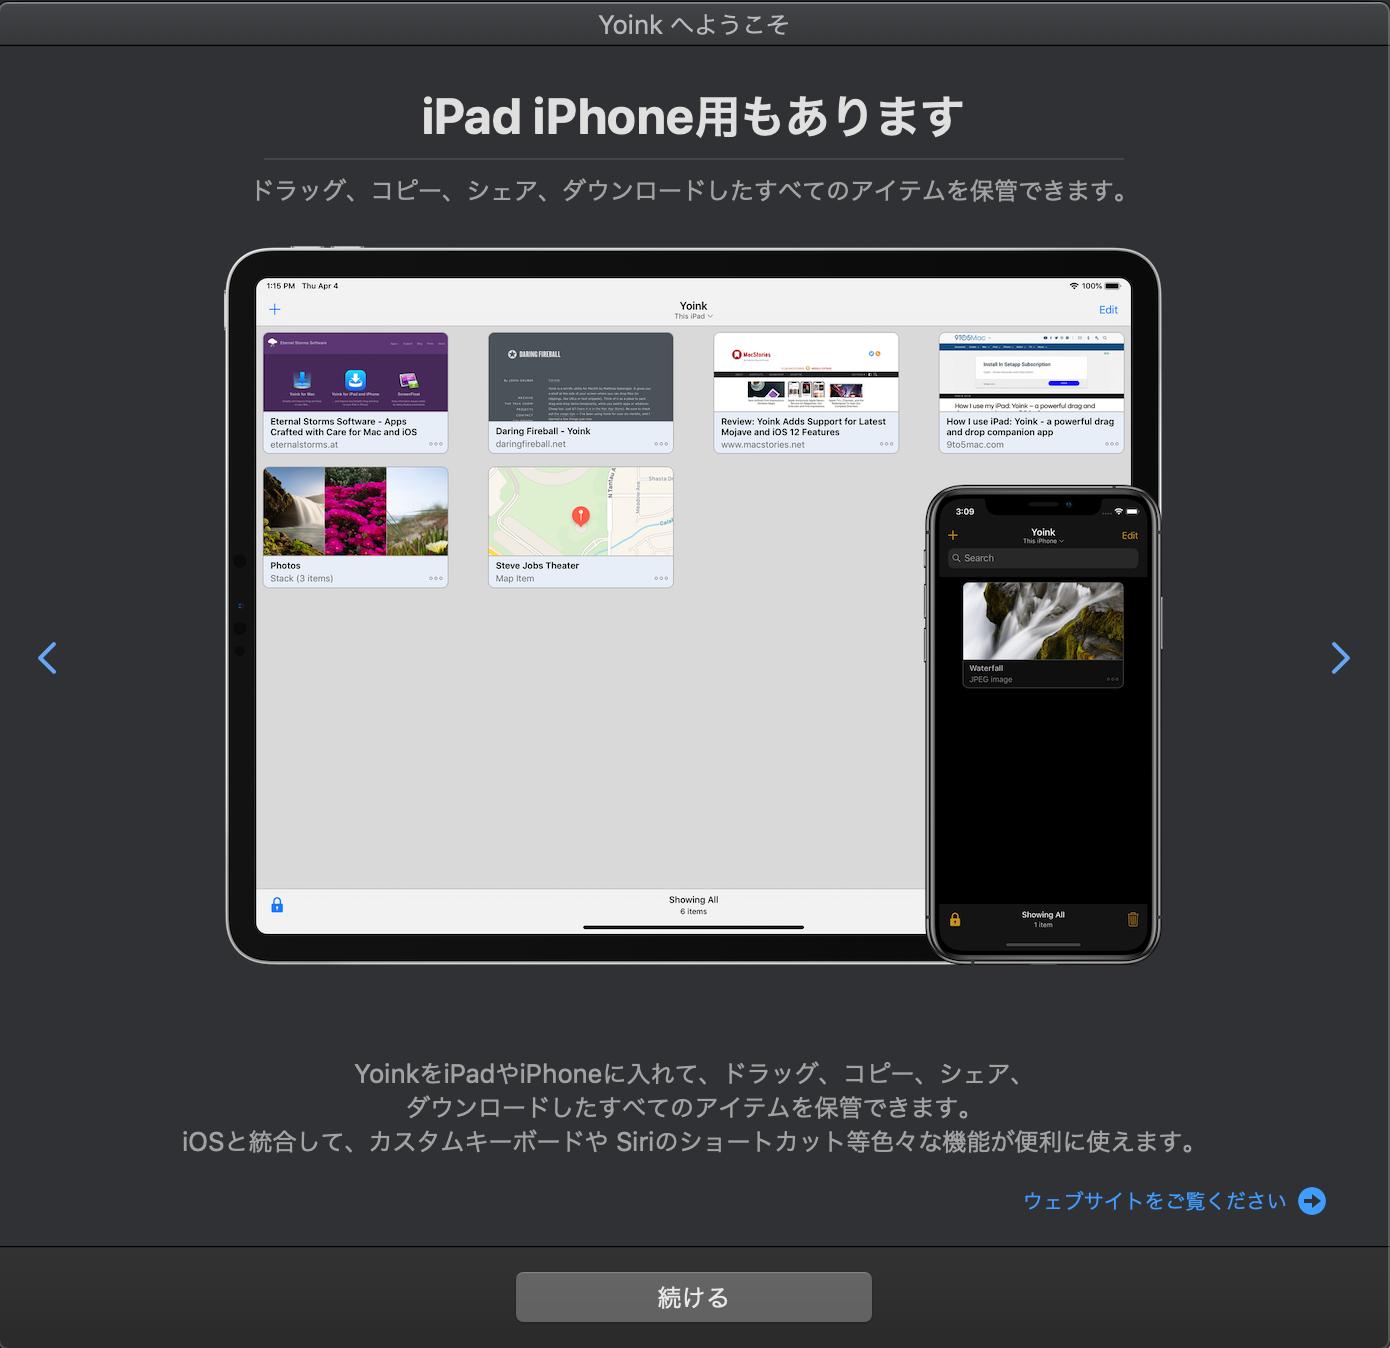 ScreenShot 22.png